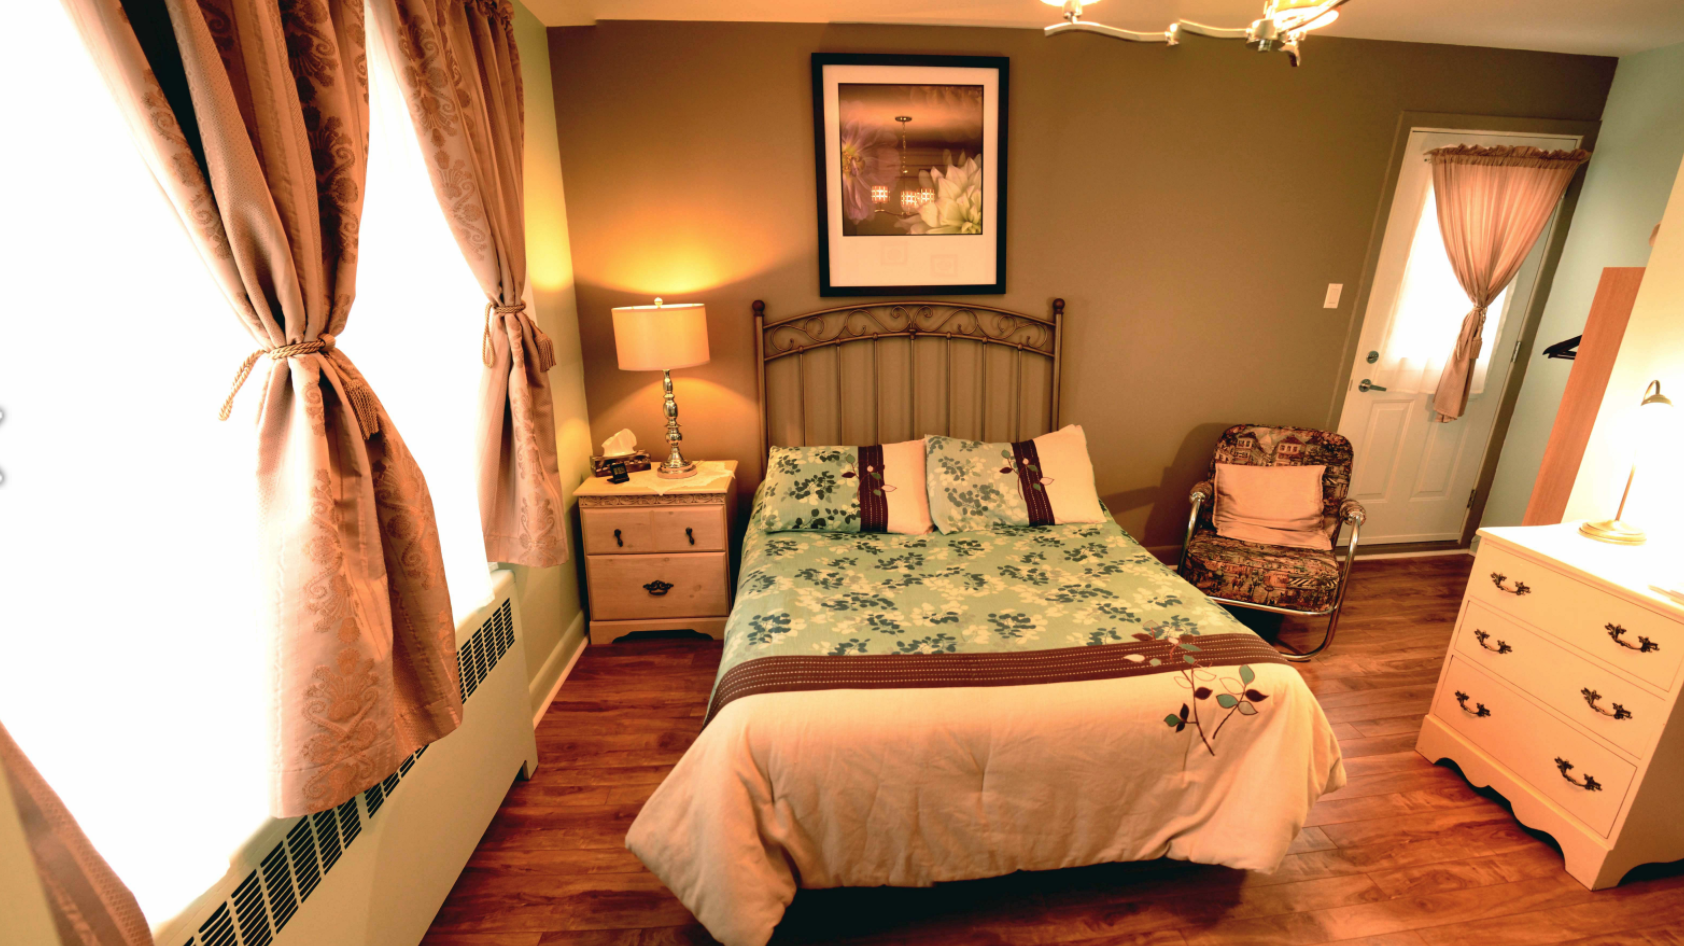 https://www.hotelsbyday.com/_data/default-hotel_image/1/7933/capture-d-e-cran-2018-01-08-a-10-54-52.png